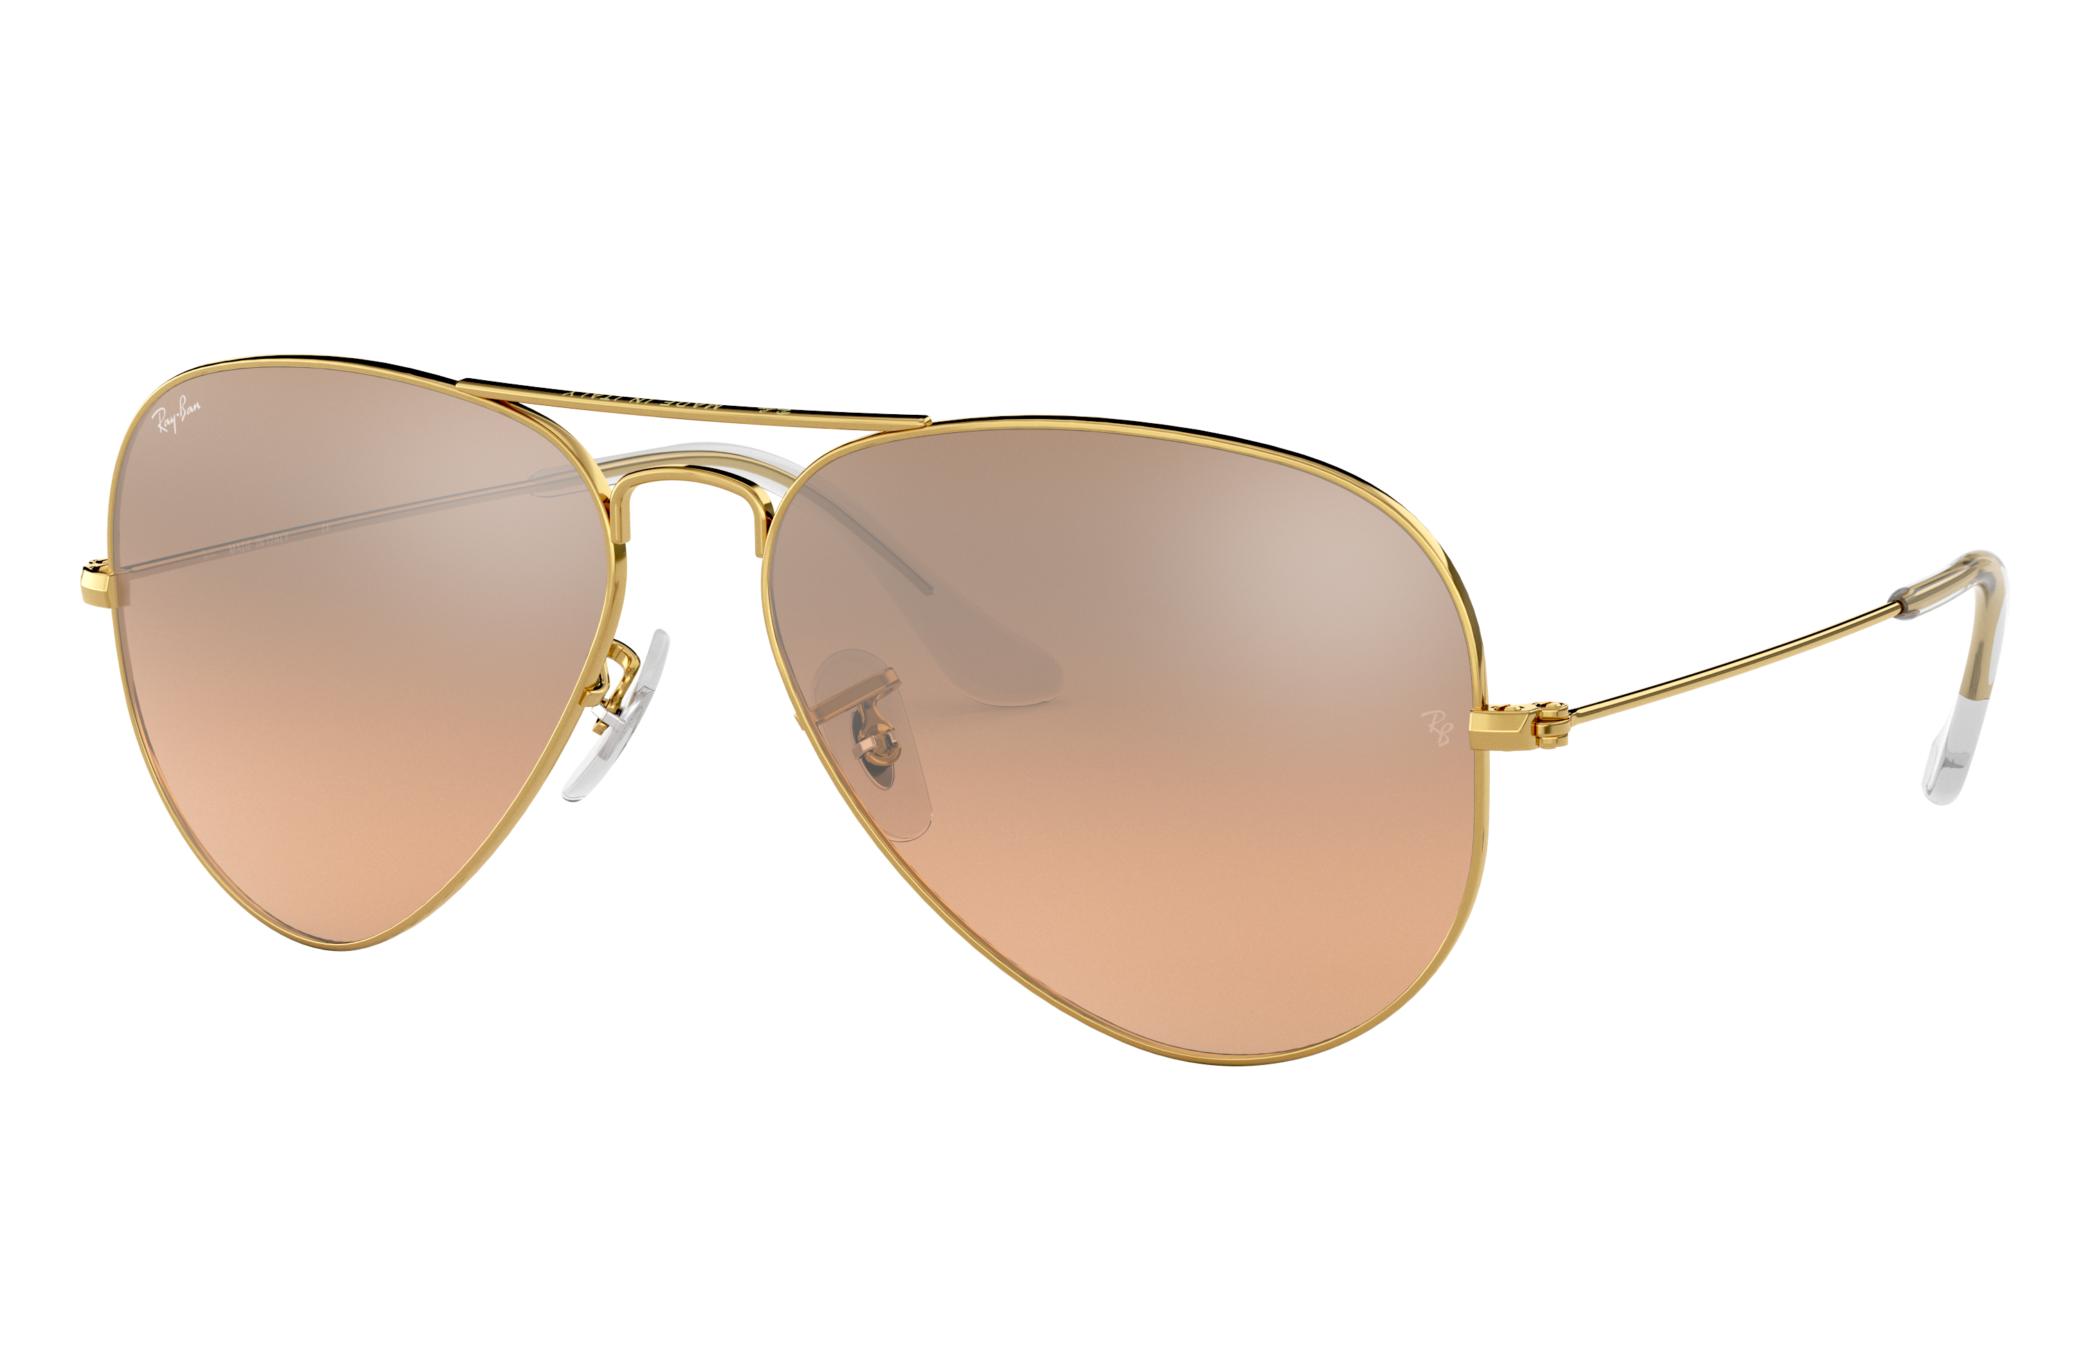 Ray-Ban Aviator Gradient Gold, Gray Lenses - RB3025